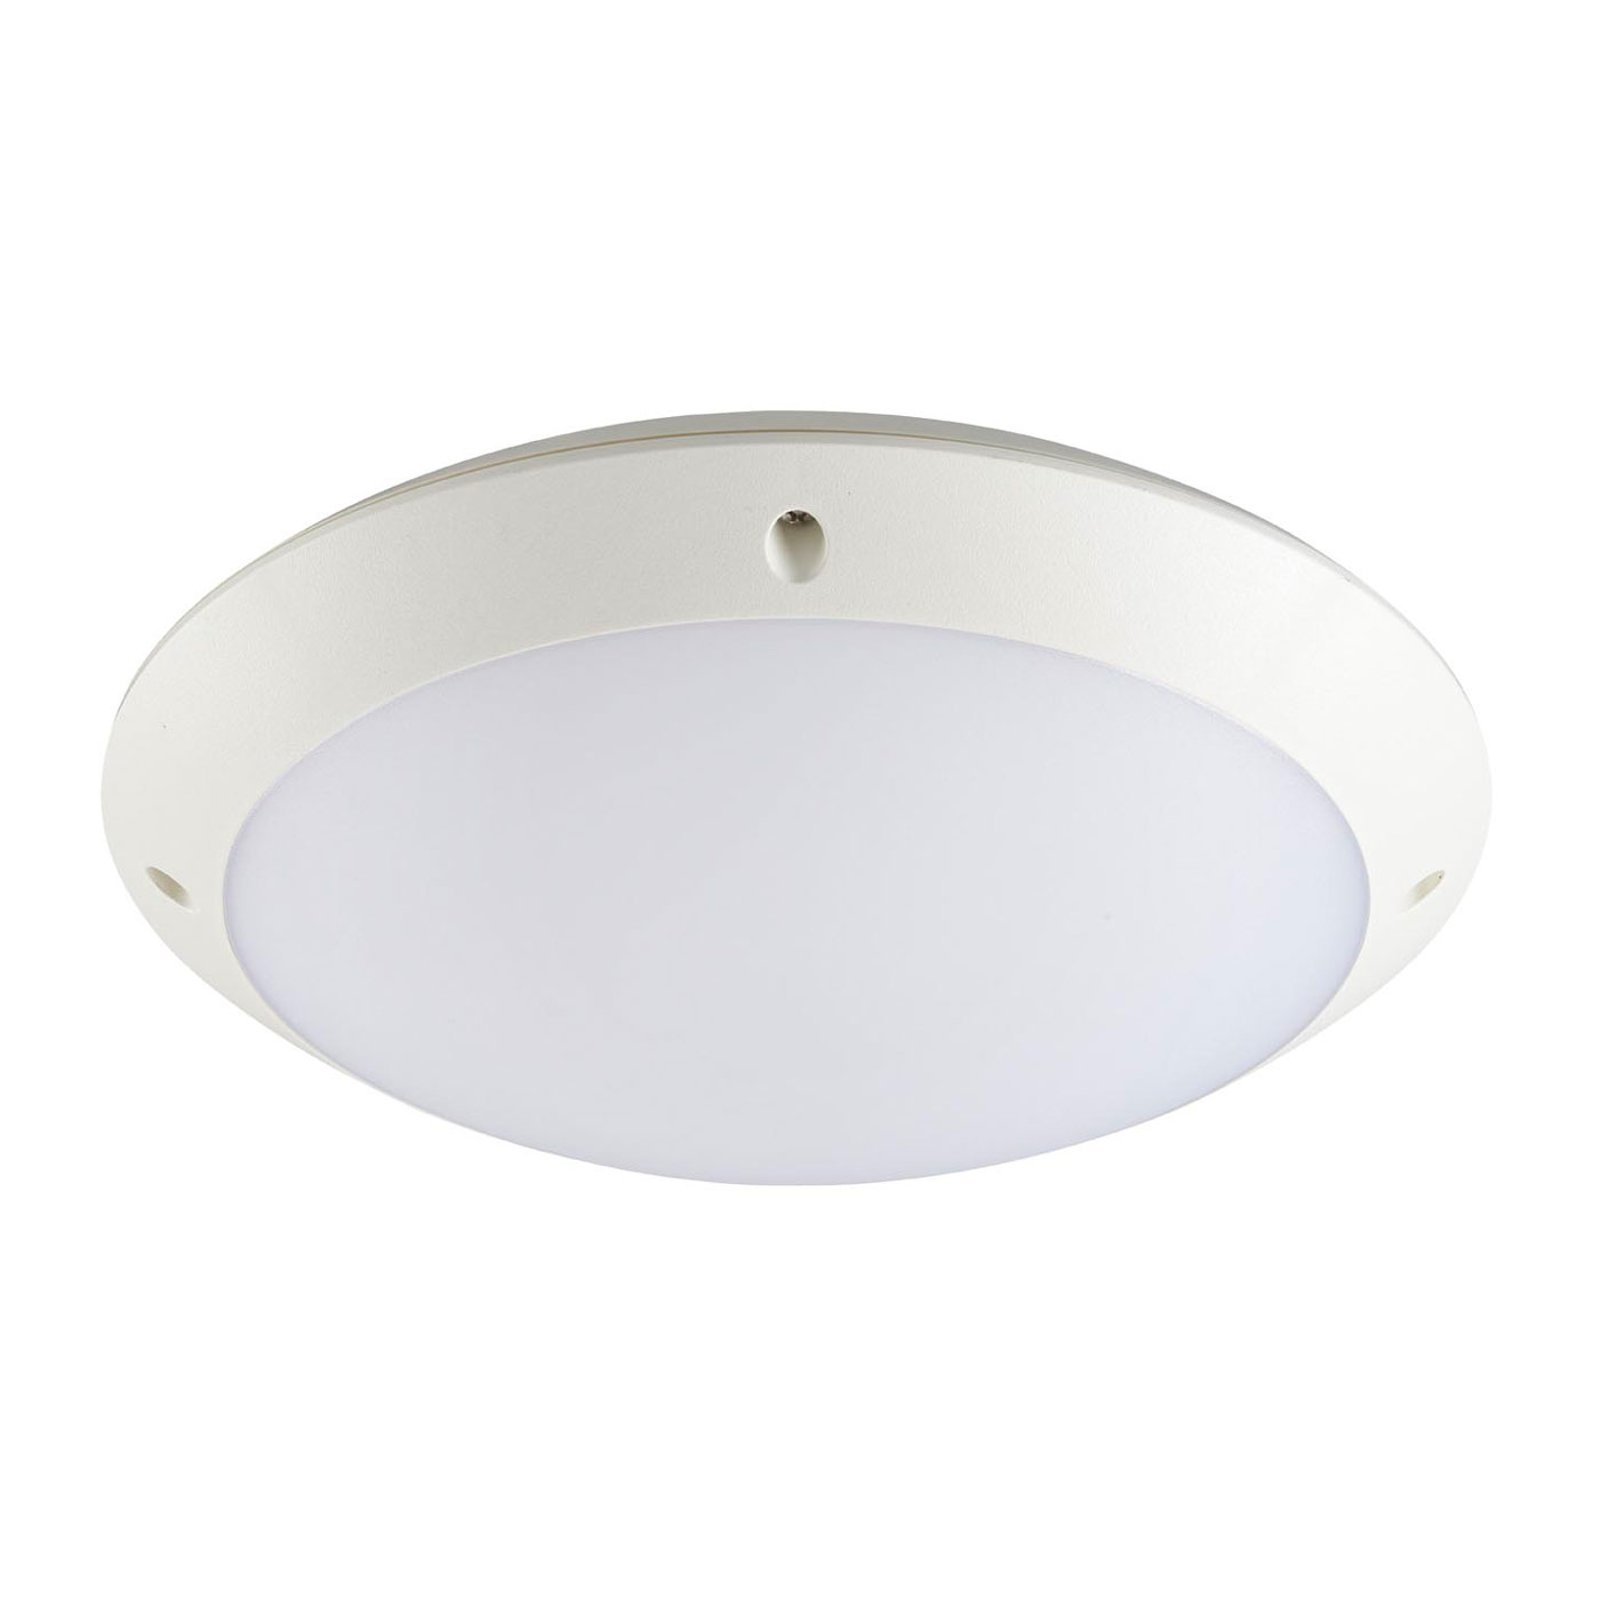 Sylvania Start taklampe SensorDim 3 000 K hvit